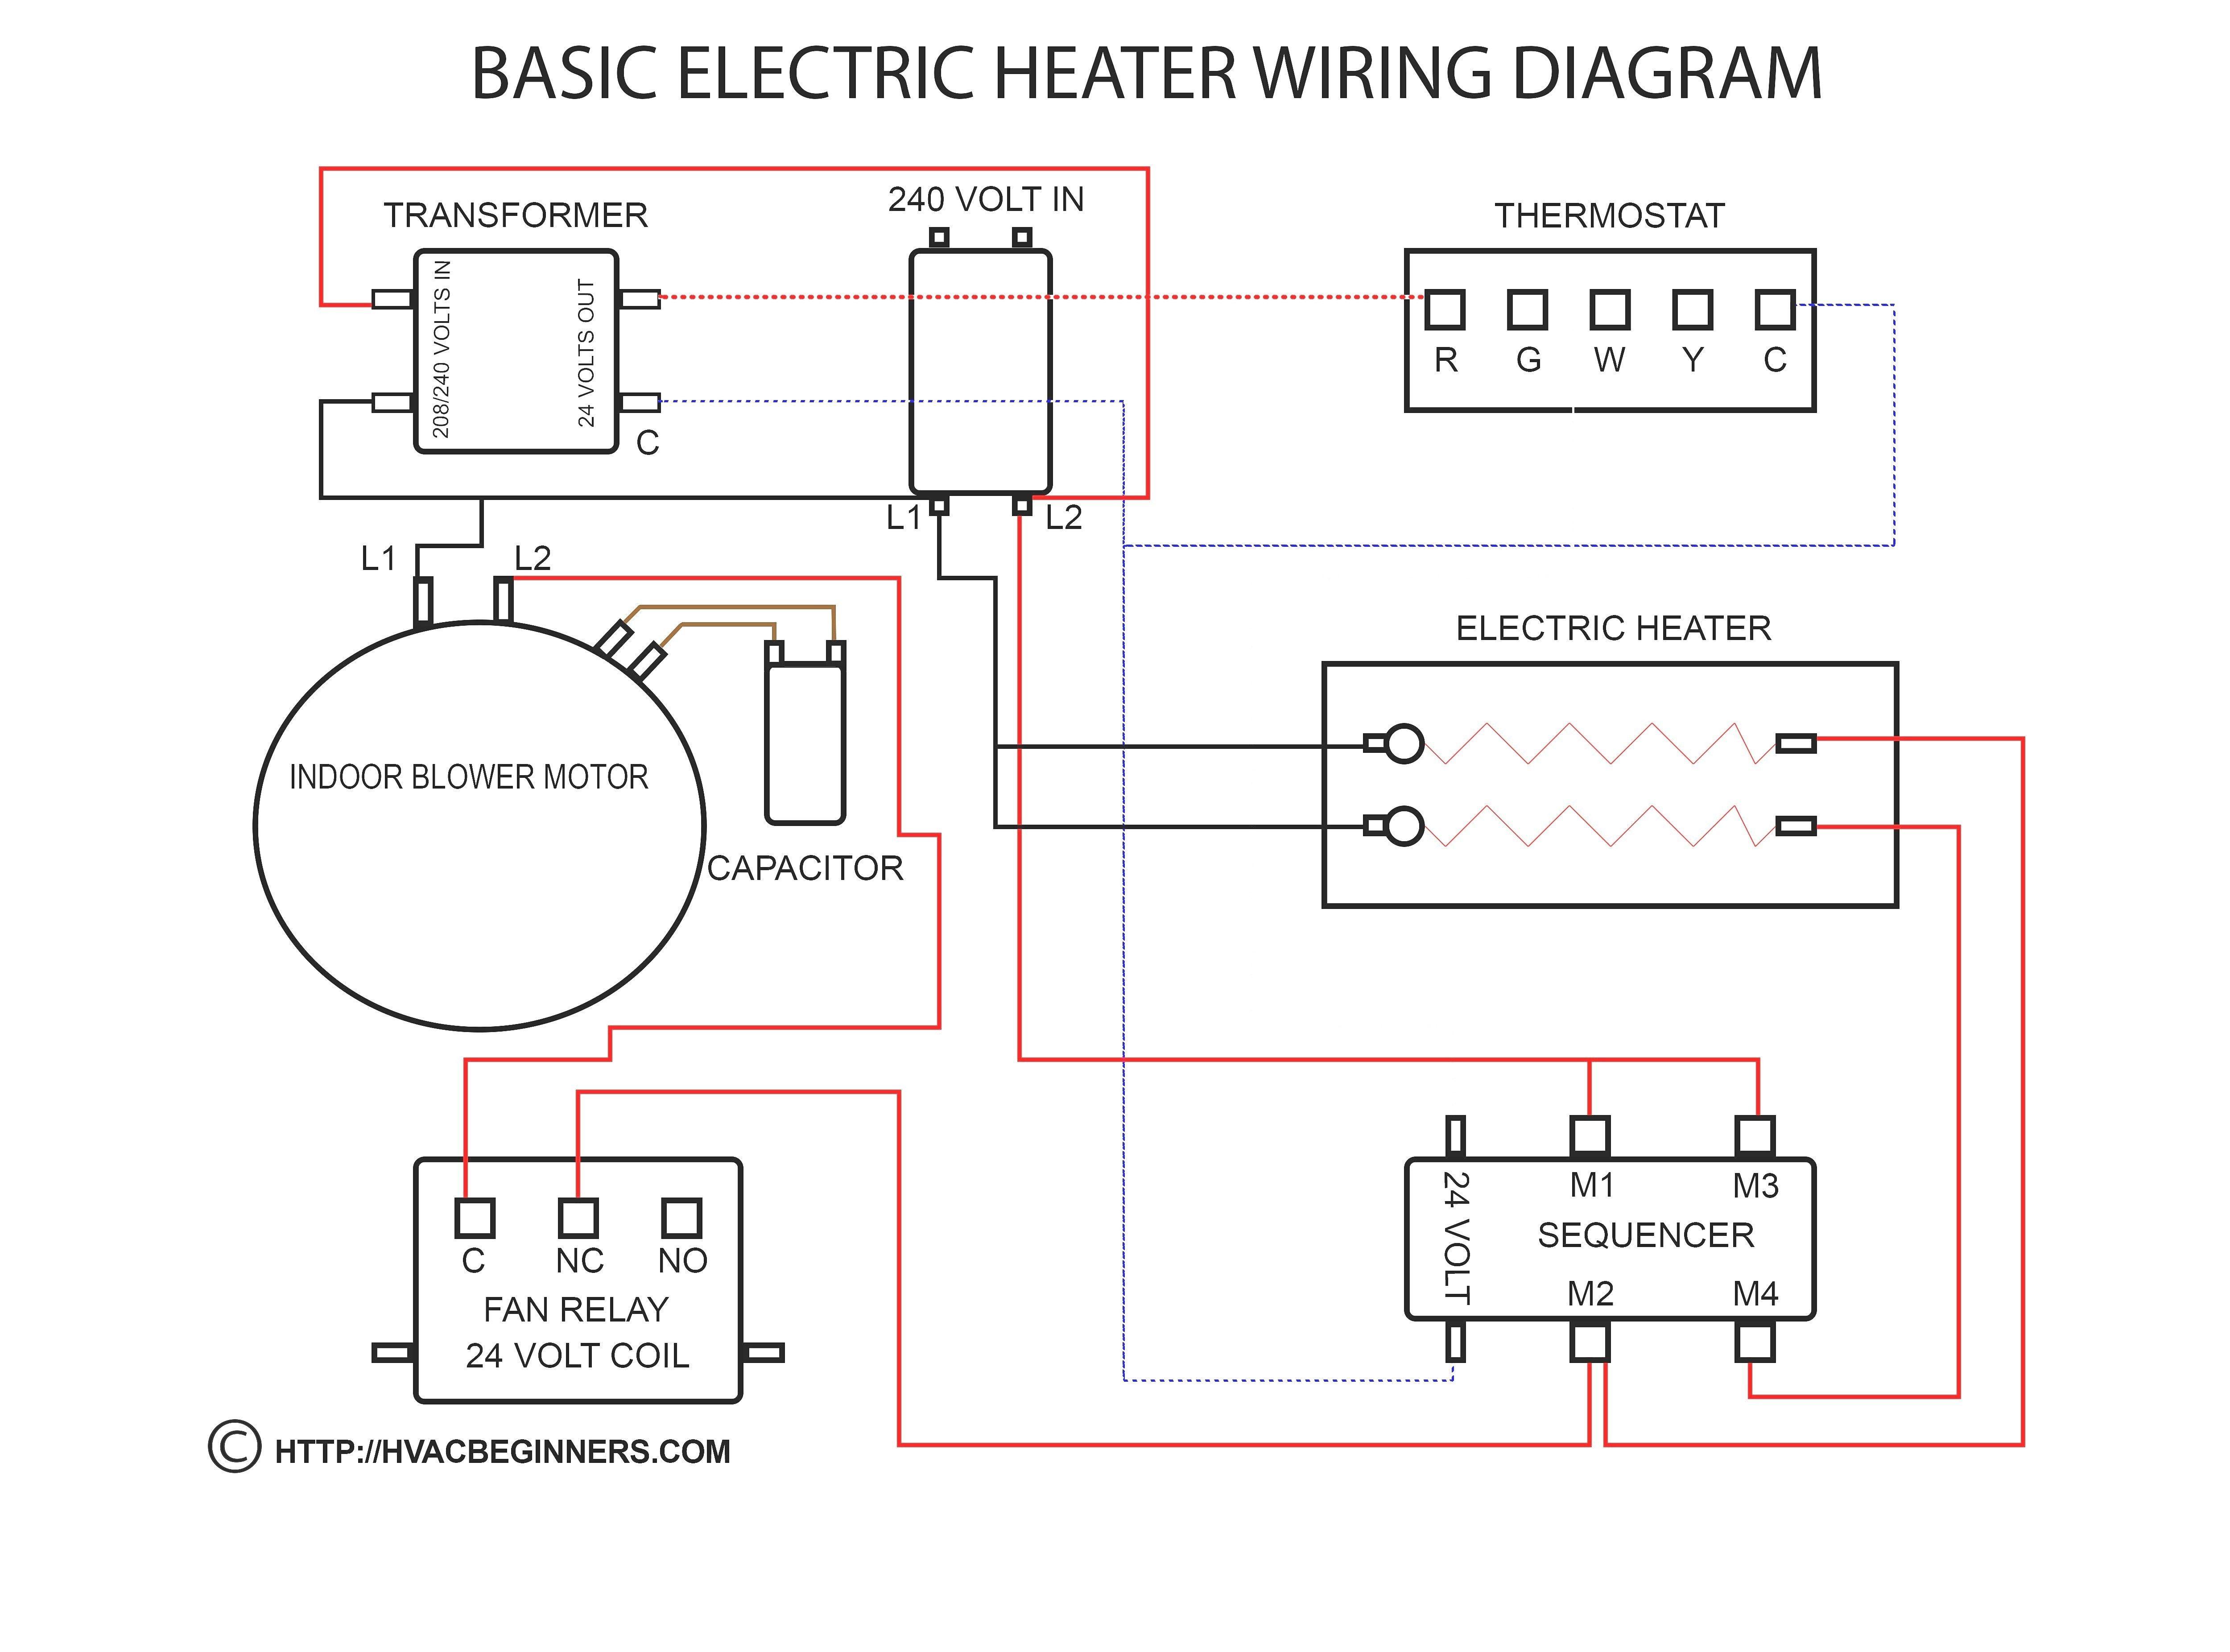 New Free Vehicle Wiring Diagrams Pdf Diagram Wiringdiagram Diagramming Diagramm Visu Electrical Circuit Diagram Basic Electrical Wiring Electrical Diagram